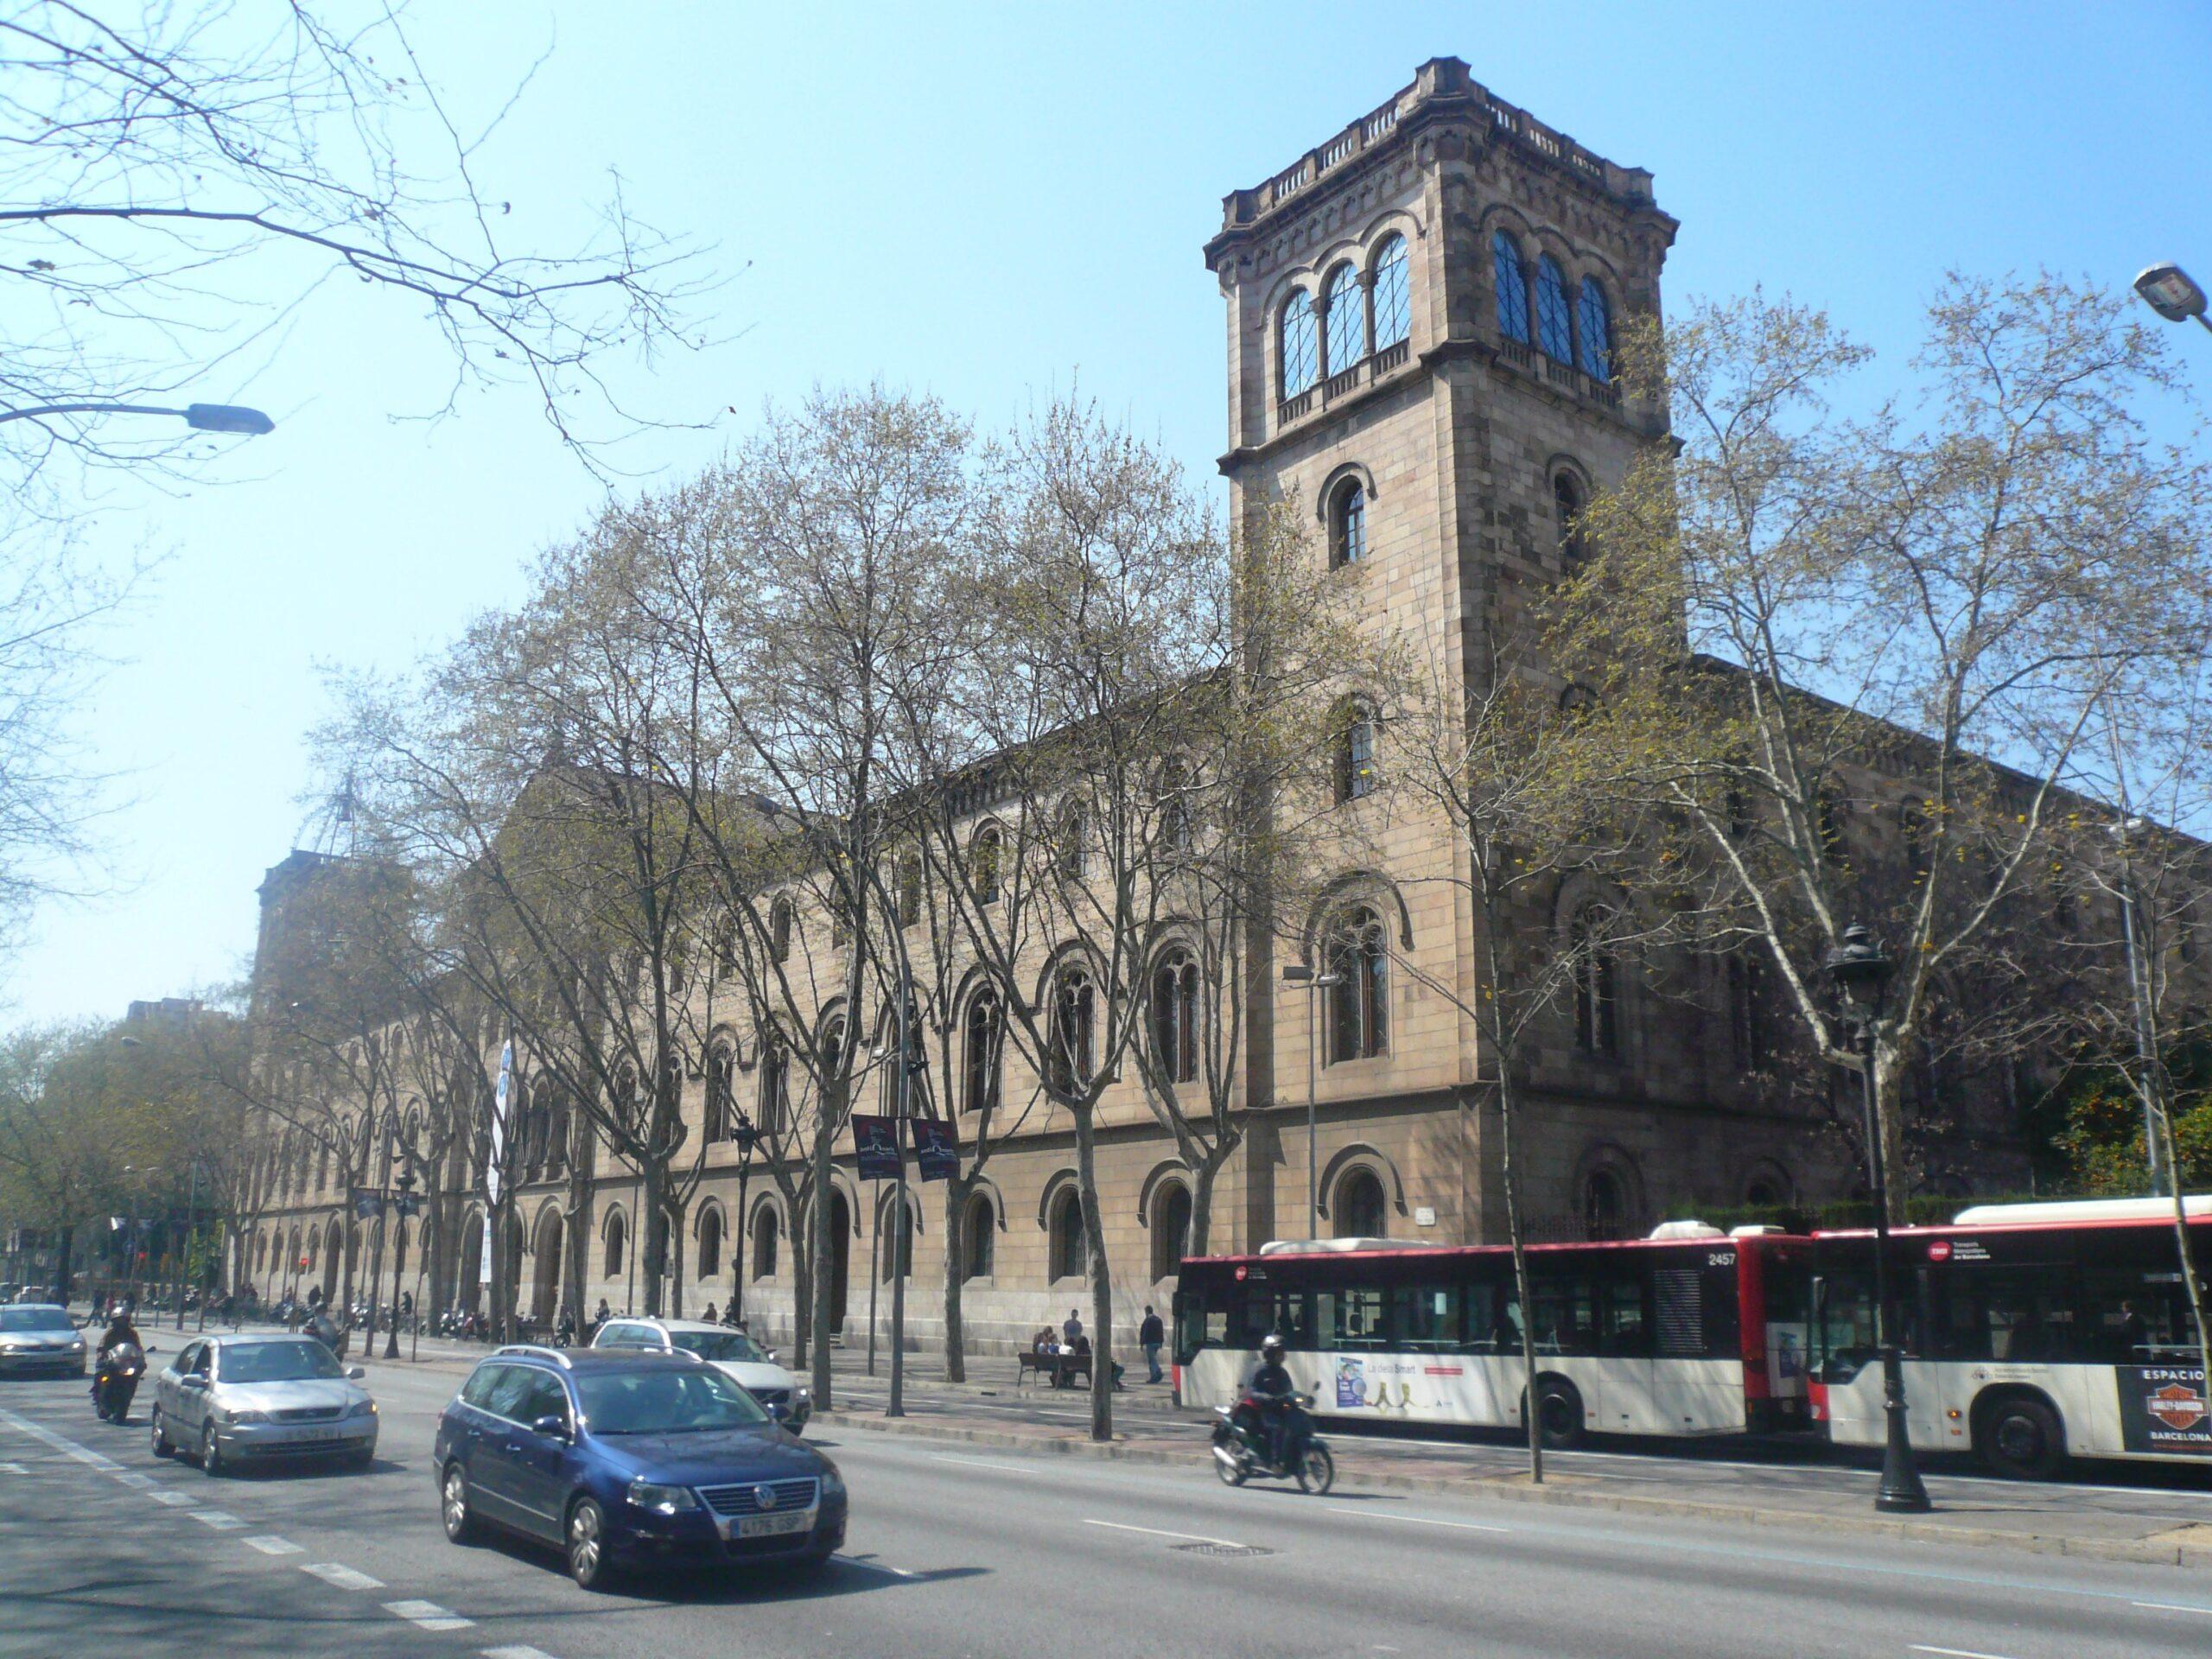 Façana de l'edifici de la Universitat de Barcelona